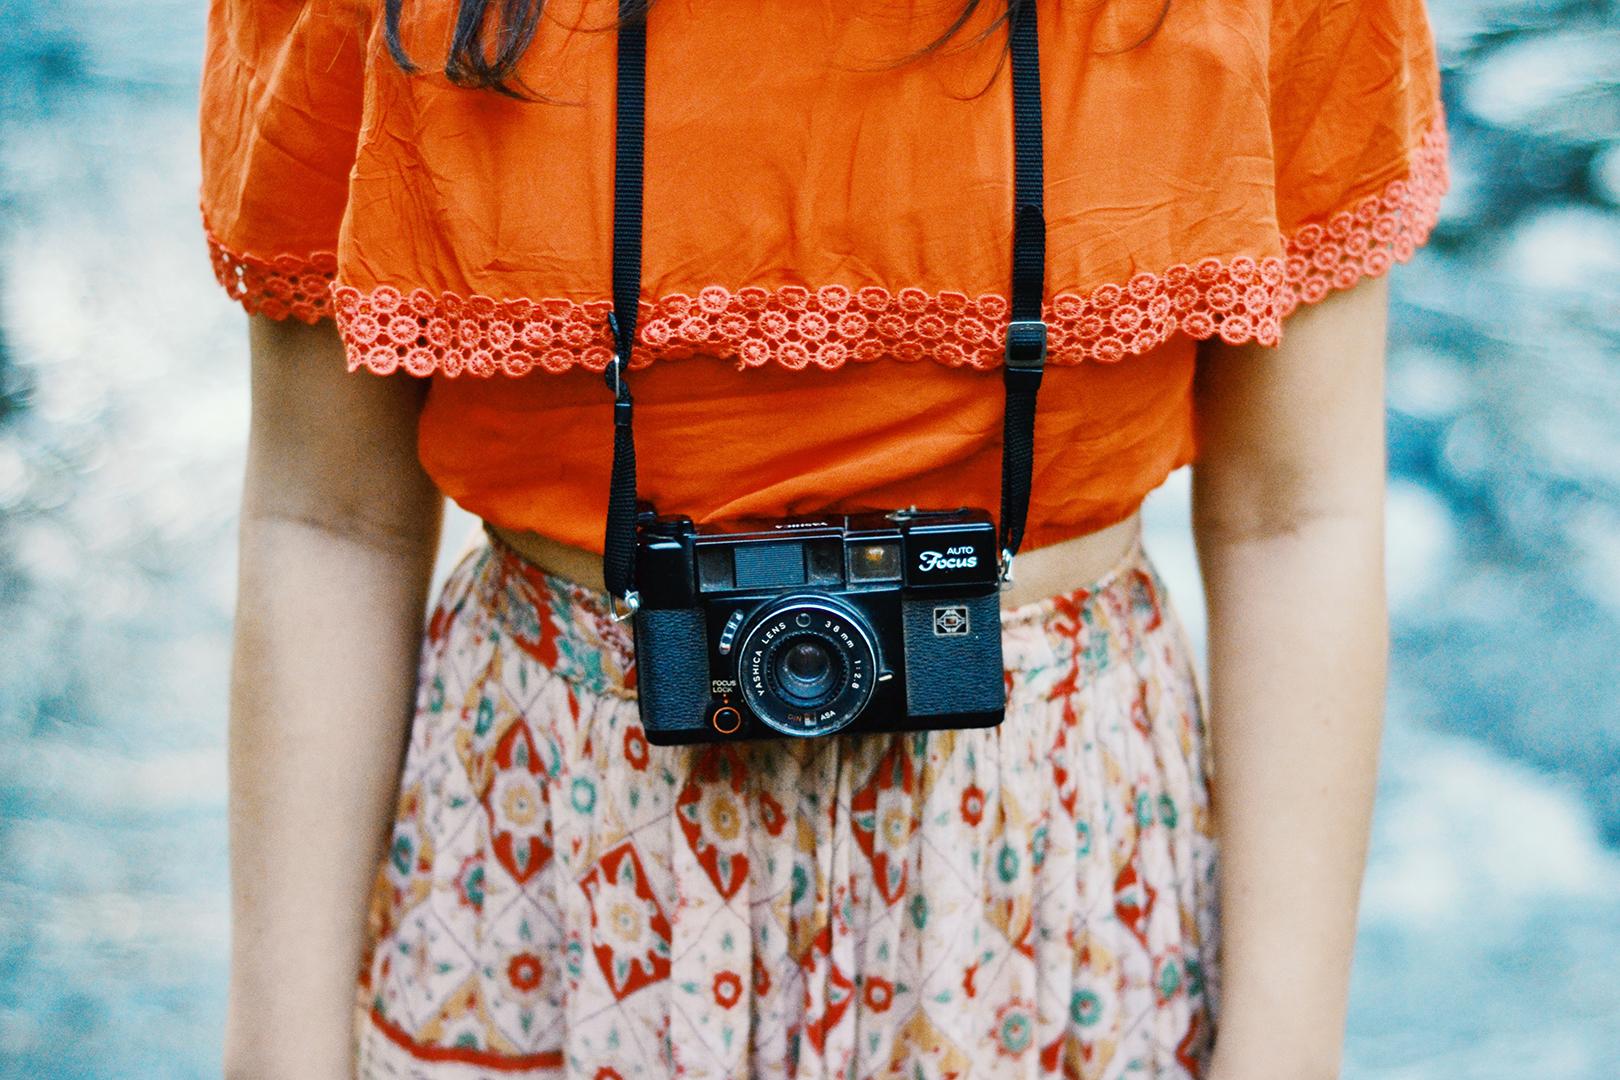 using analog cameras